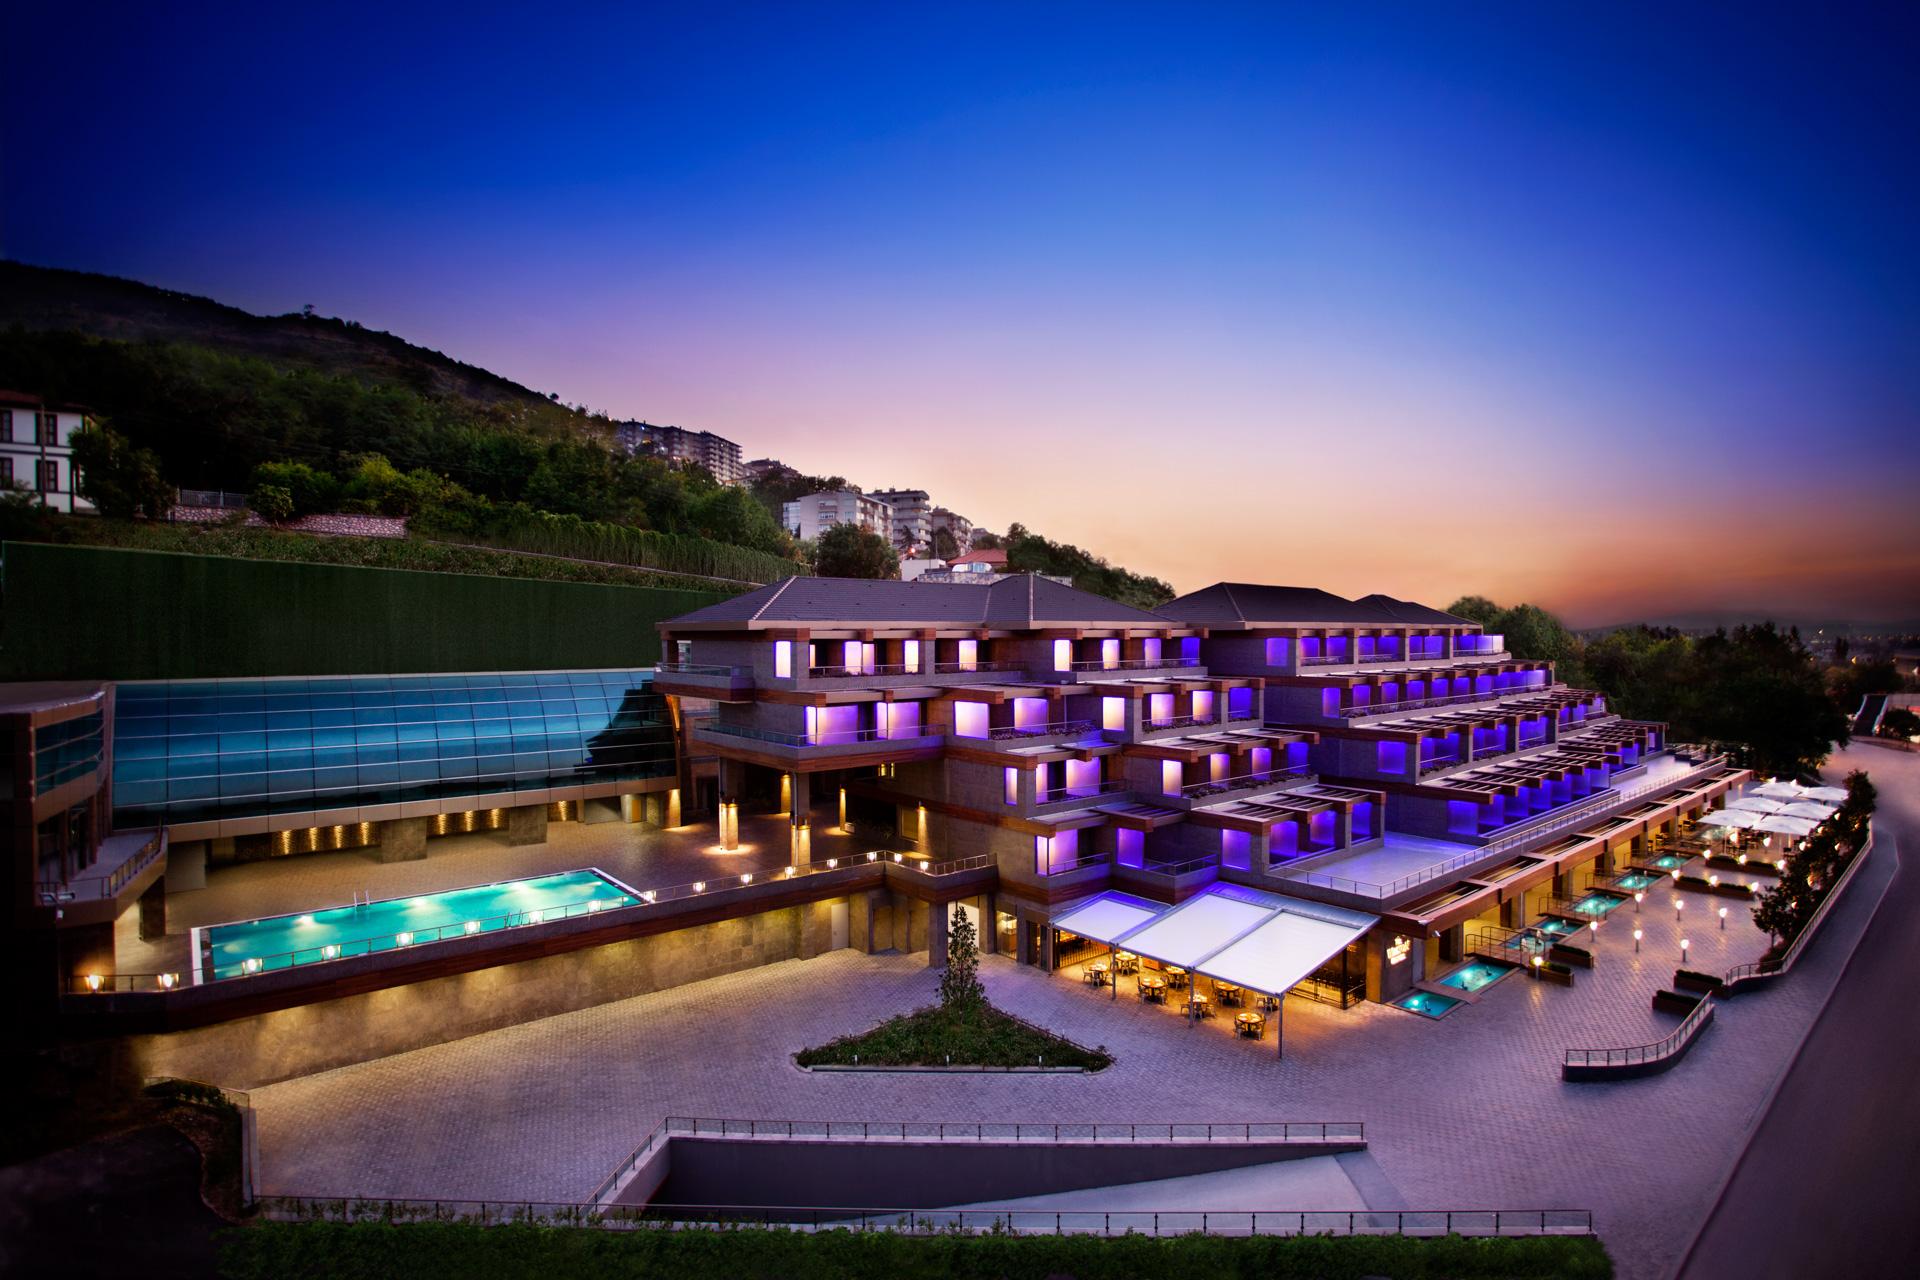 Divan Hotel Bursa | Exterior View